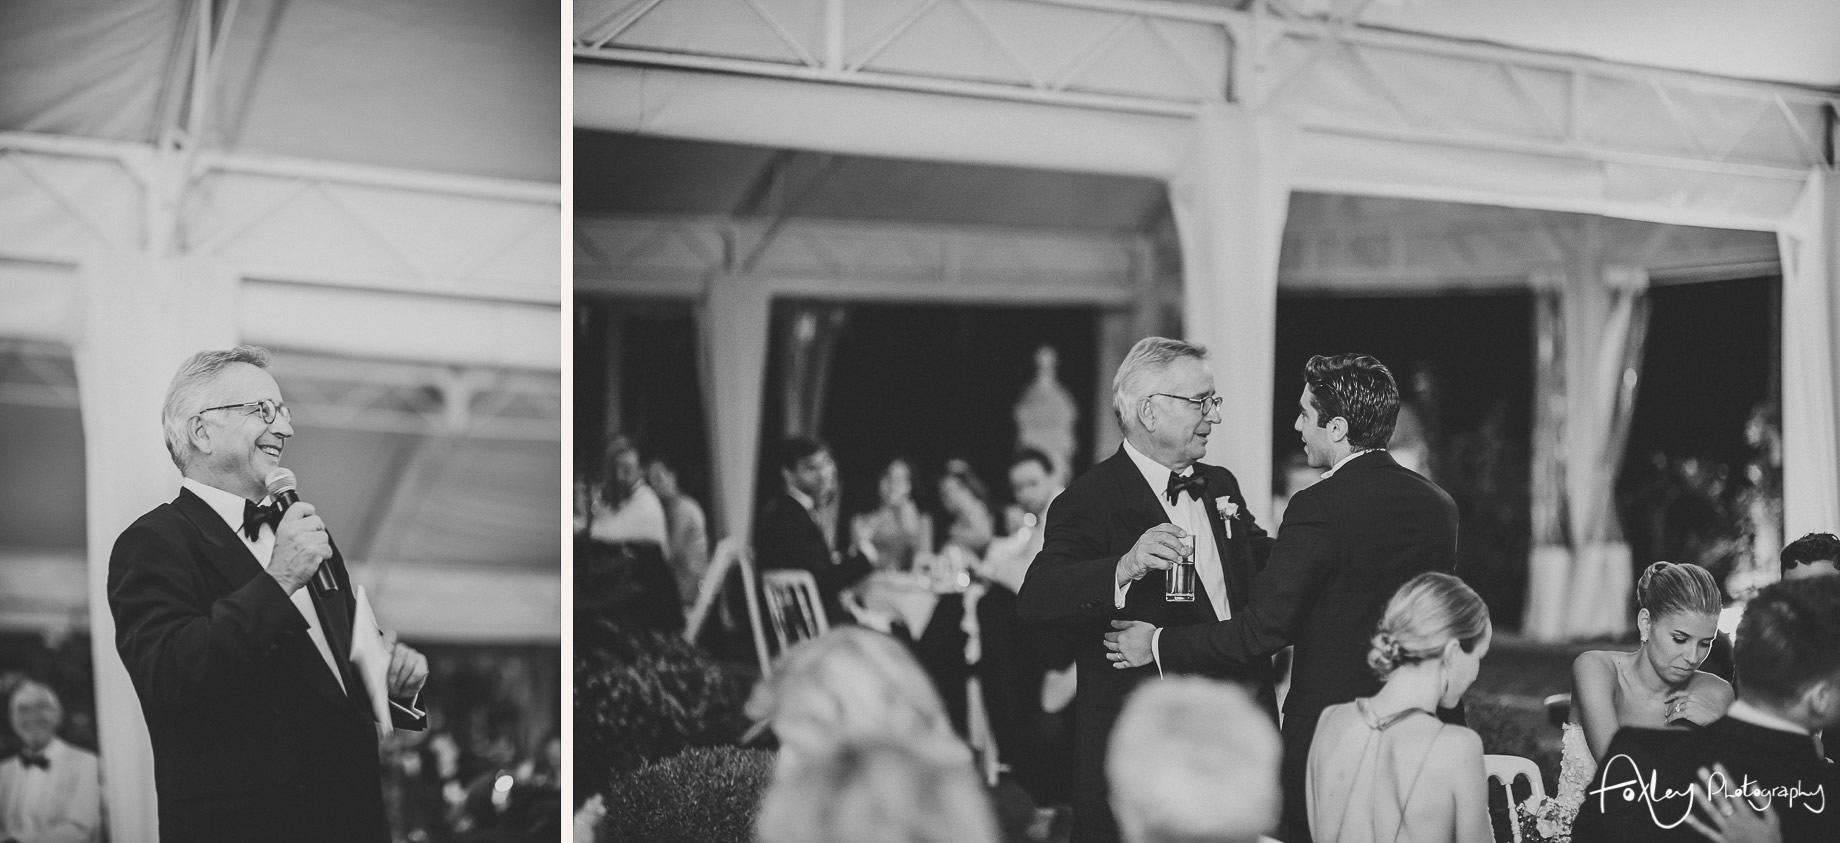 Jil and Will's Wedding at Villa Ephrussi De Rothschild 202